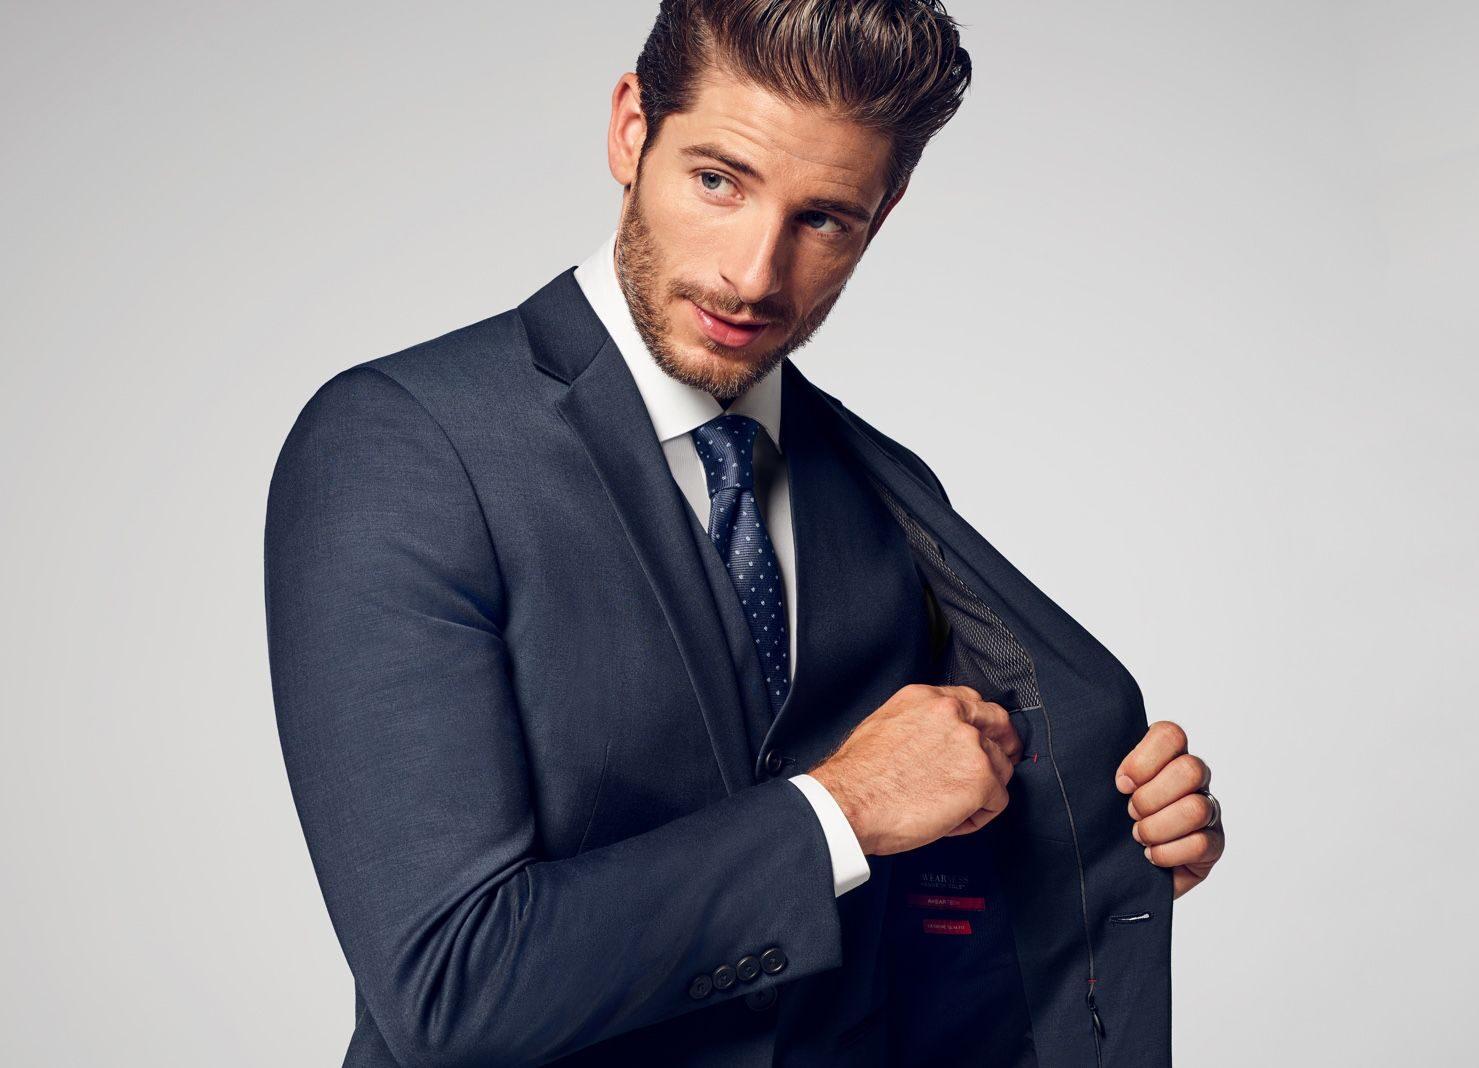 Tuxedo Rental, Men\'s Tuxedos for Rent | Men\'s Wearhouse